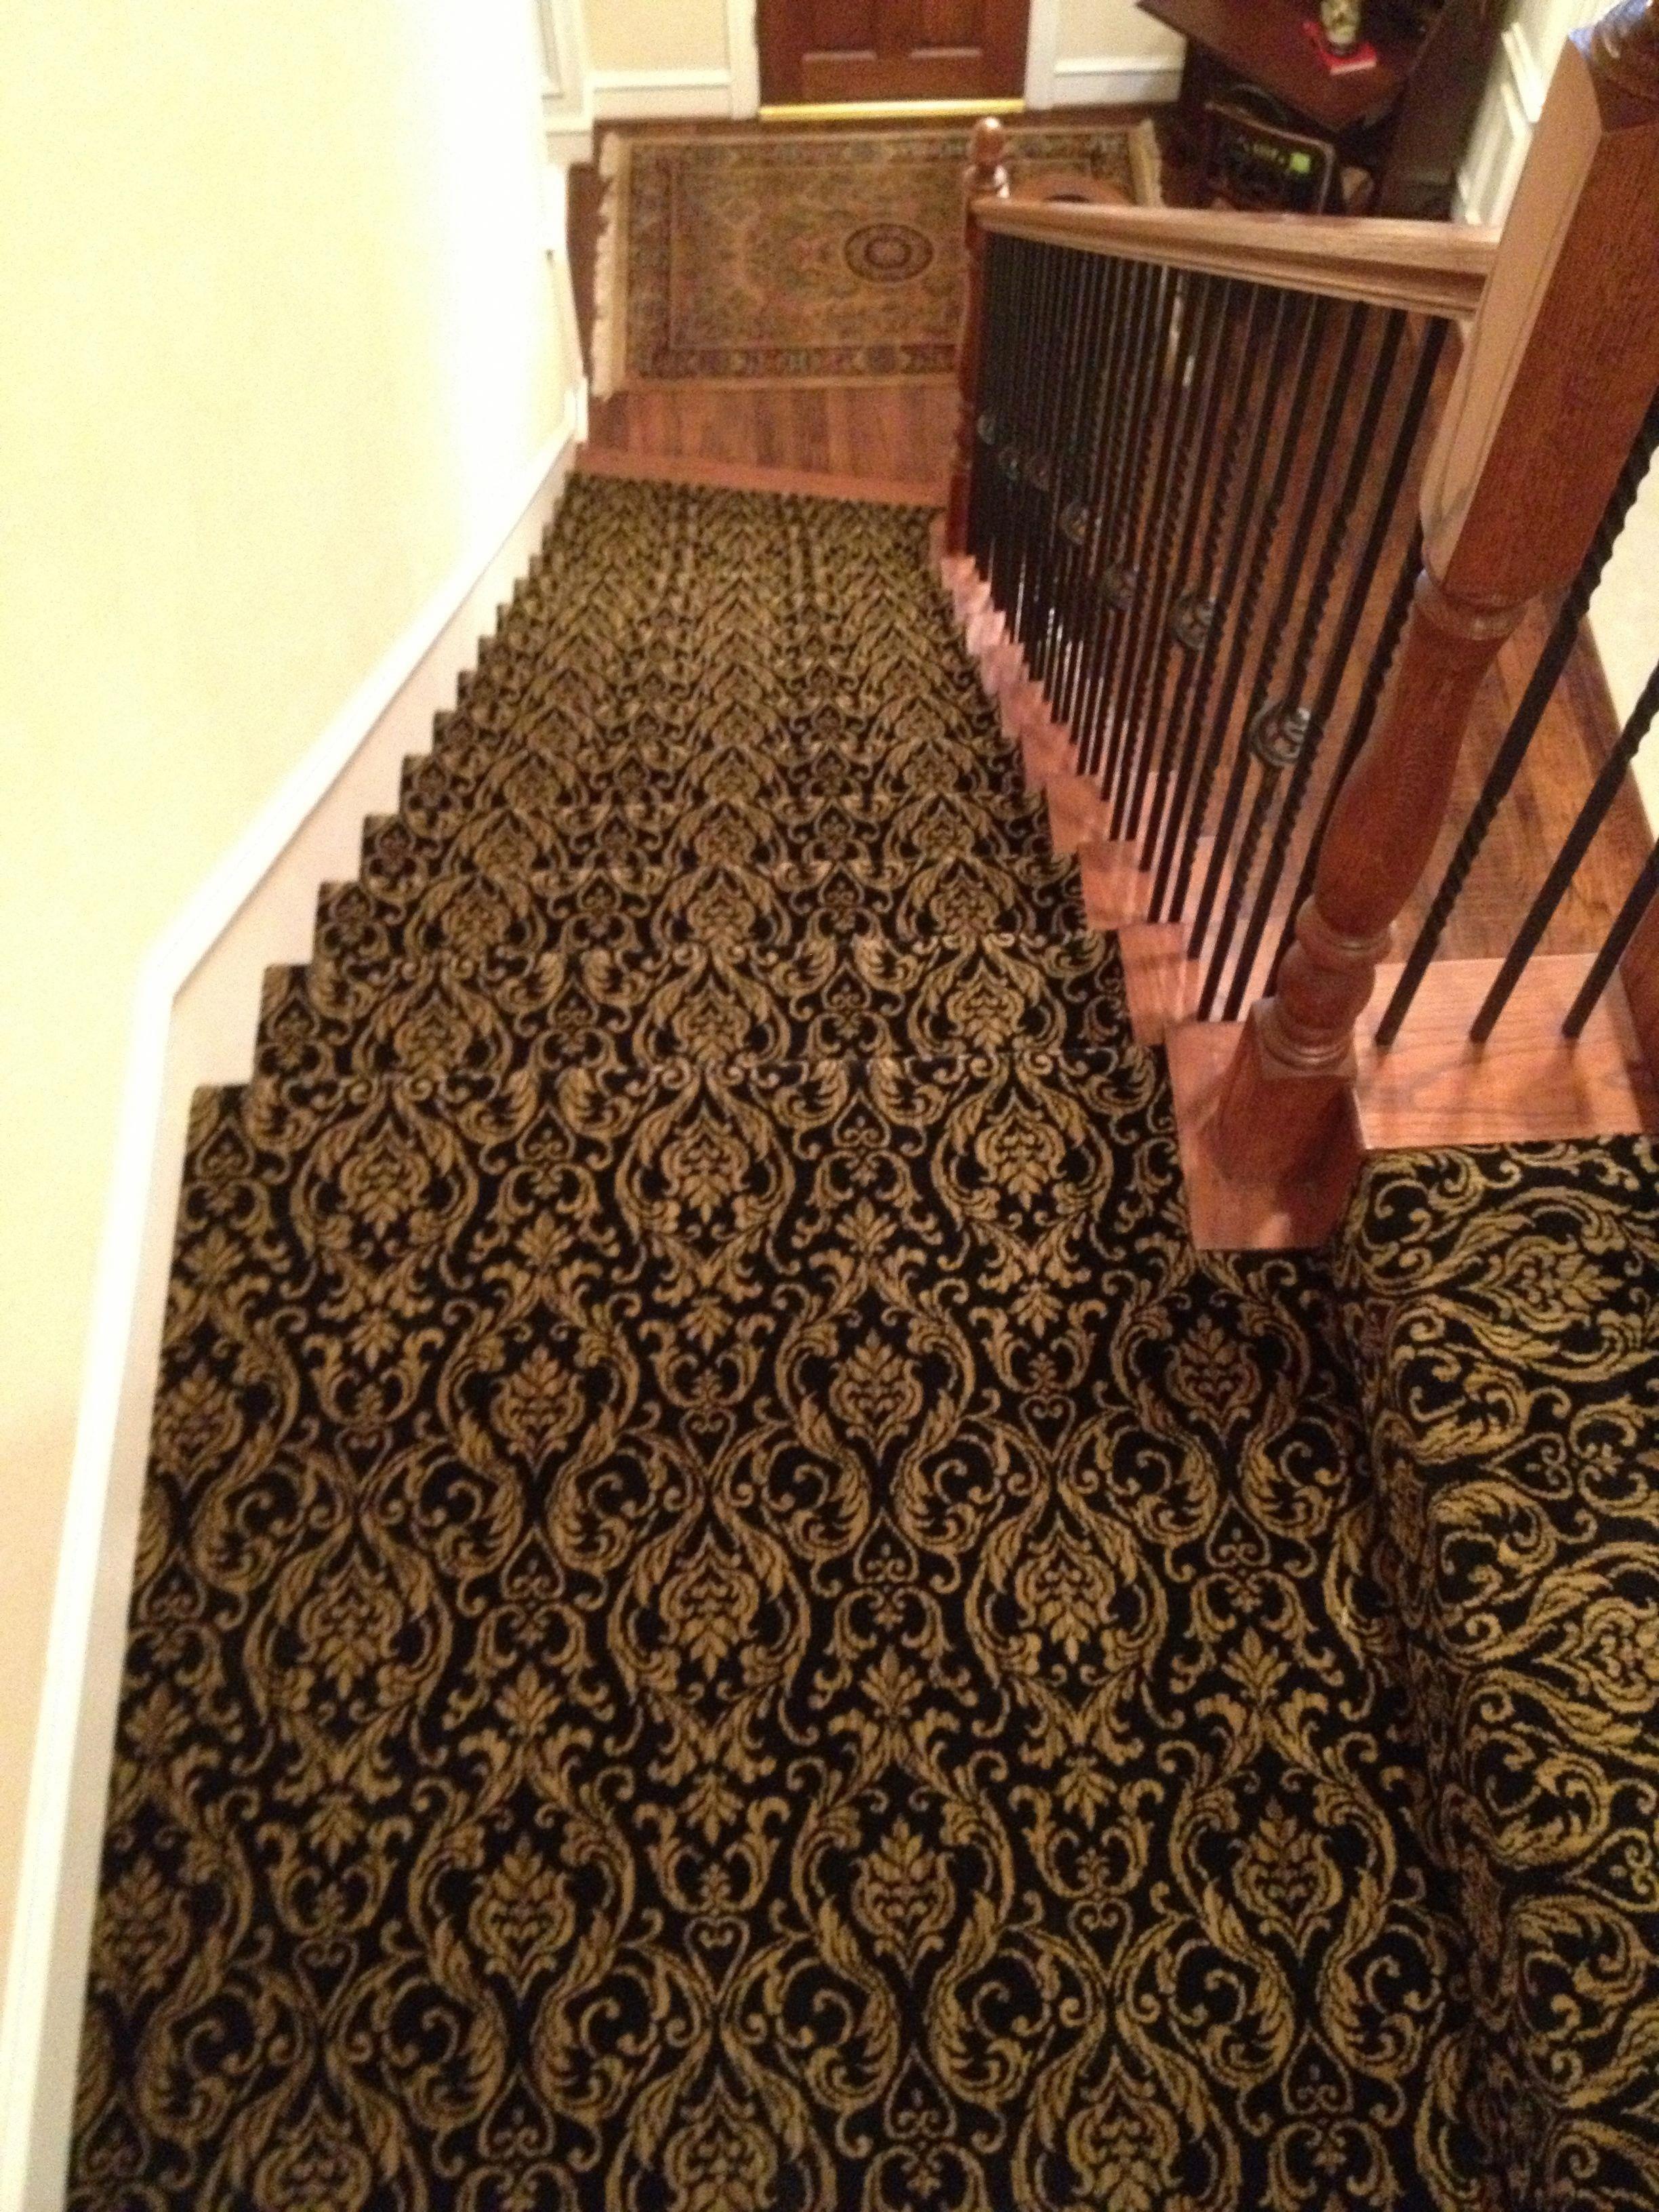 Best Carpet Runners By The Foot Canada 4Runnercarpetfloormats Code 2969288868 In 2020 Diy Carpet 640 x 480